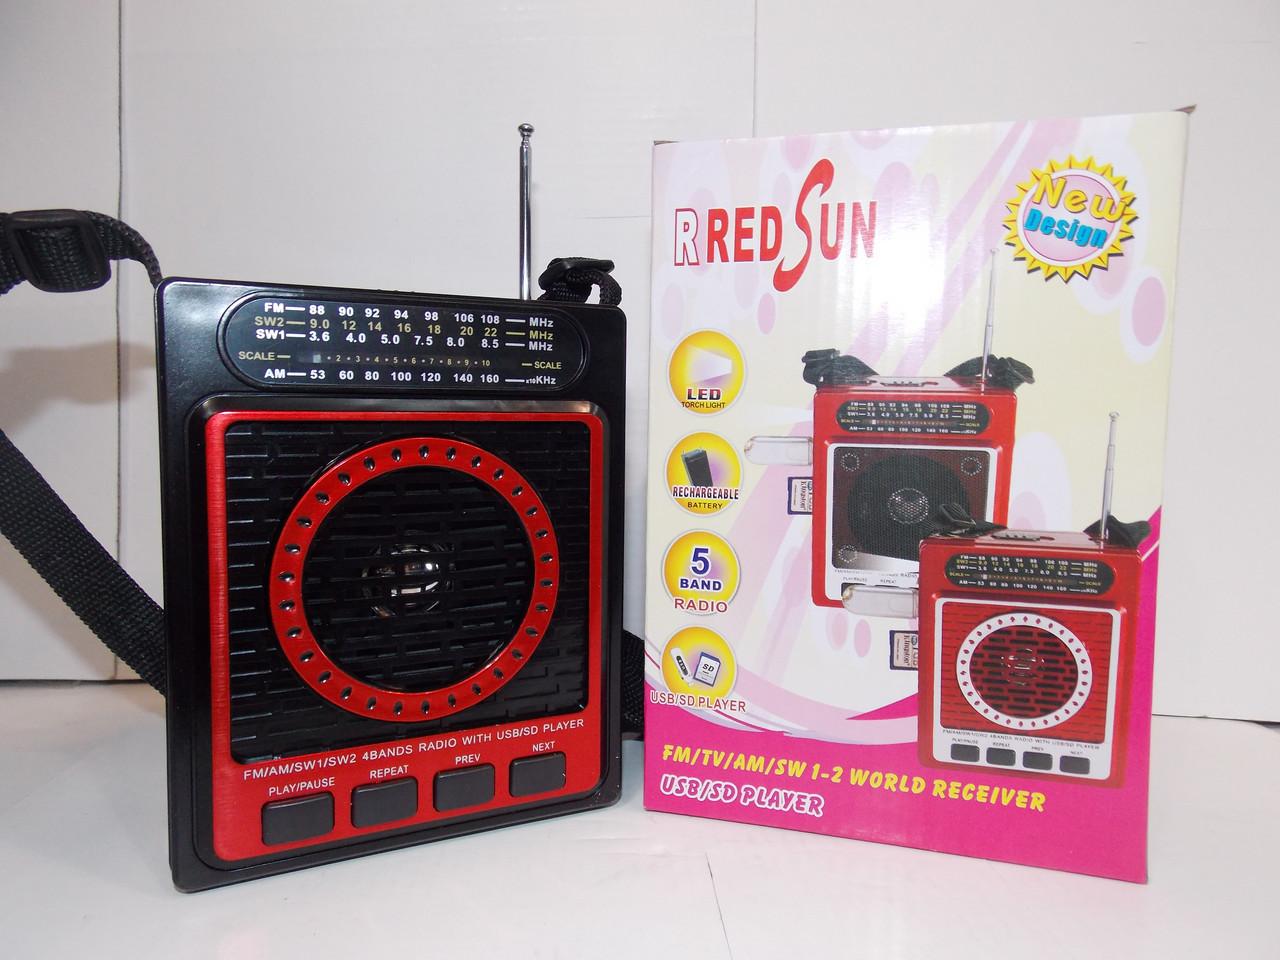 Радио RED SUN RS-084 USB SD аккумулятор ручная настройка радио